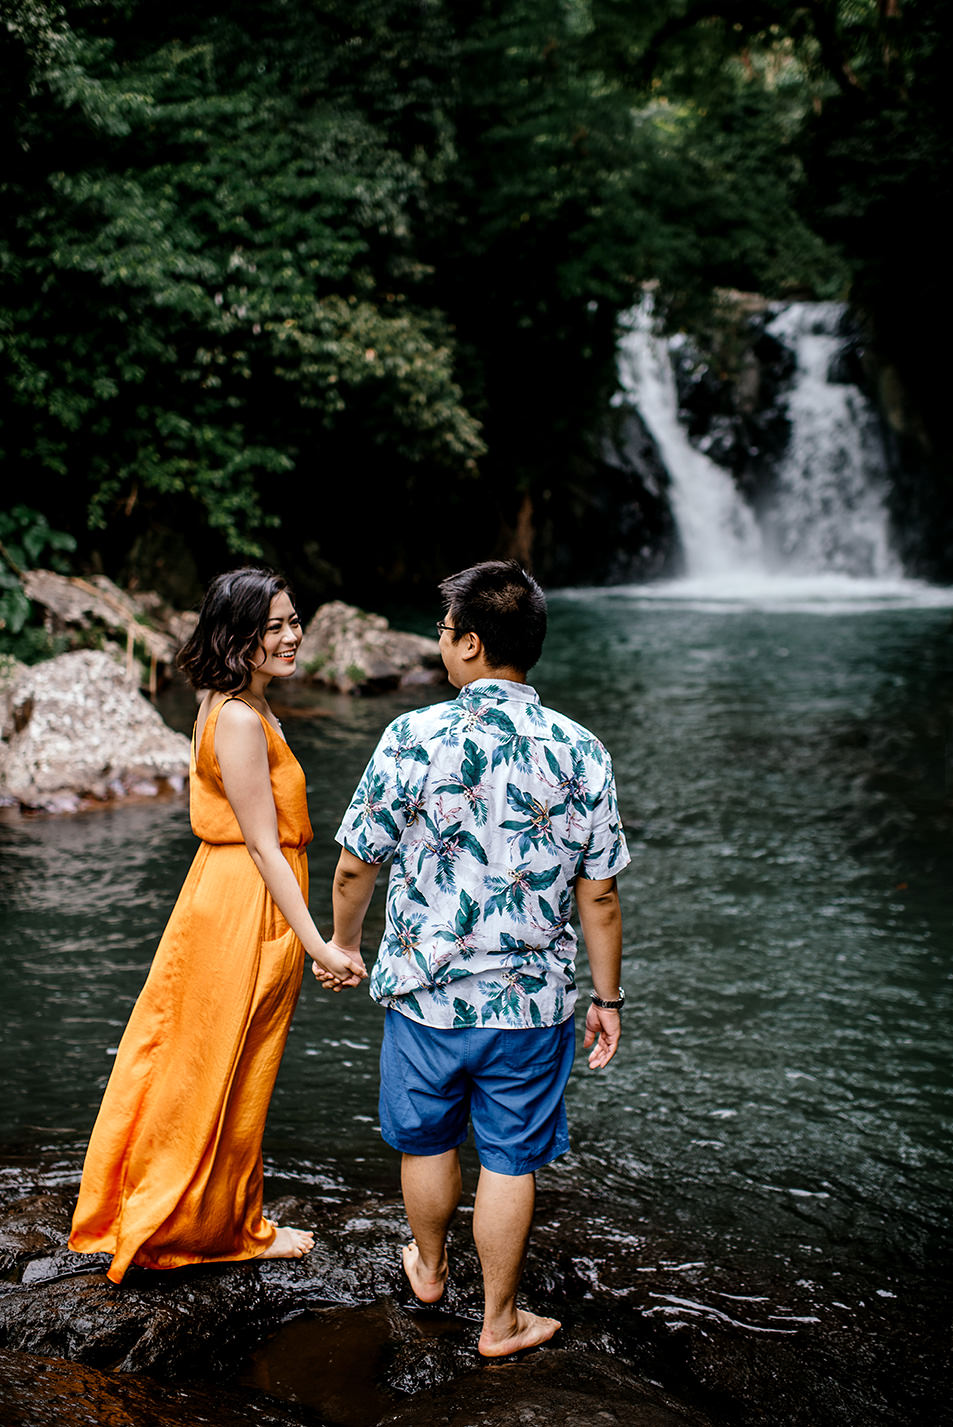 Bali-waterfall-engagment-Bali-wedding-photographer41.jpg